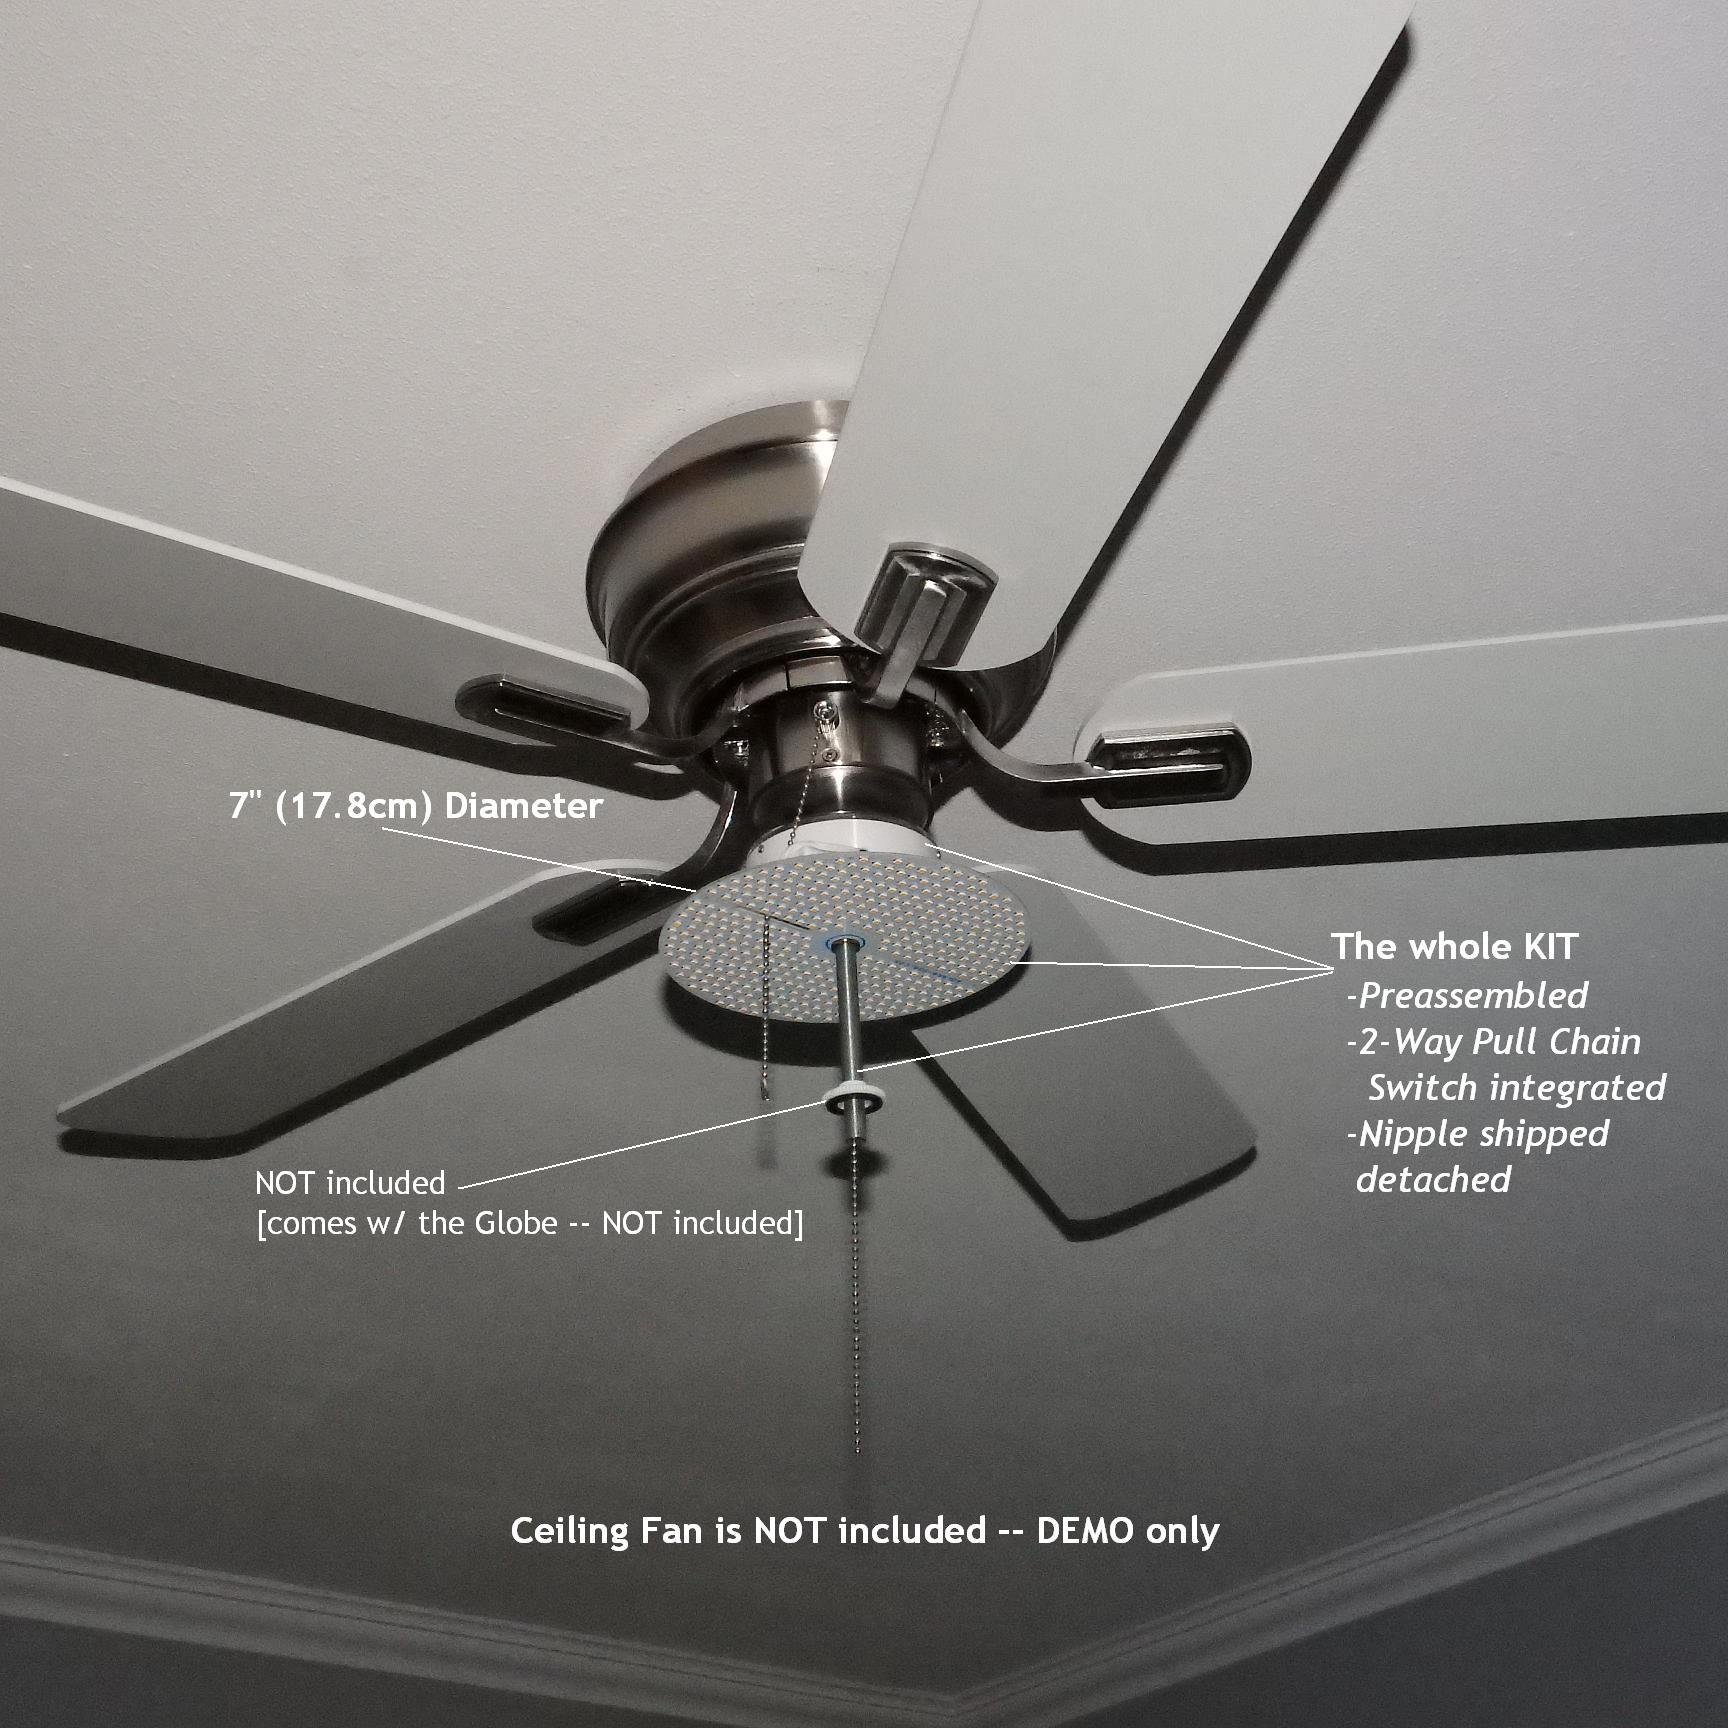 7'' Dia. WARM WHITE (4000K) LED Panel KIT for Ceiling Fan Light - PULL-CHAIN SWITCH INTEGRATED. P/N: SPTL420LMF7-CFLK-4K by SOLARA-USA